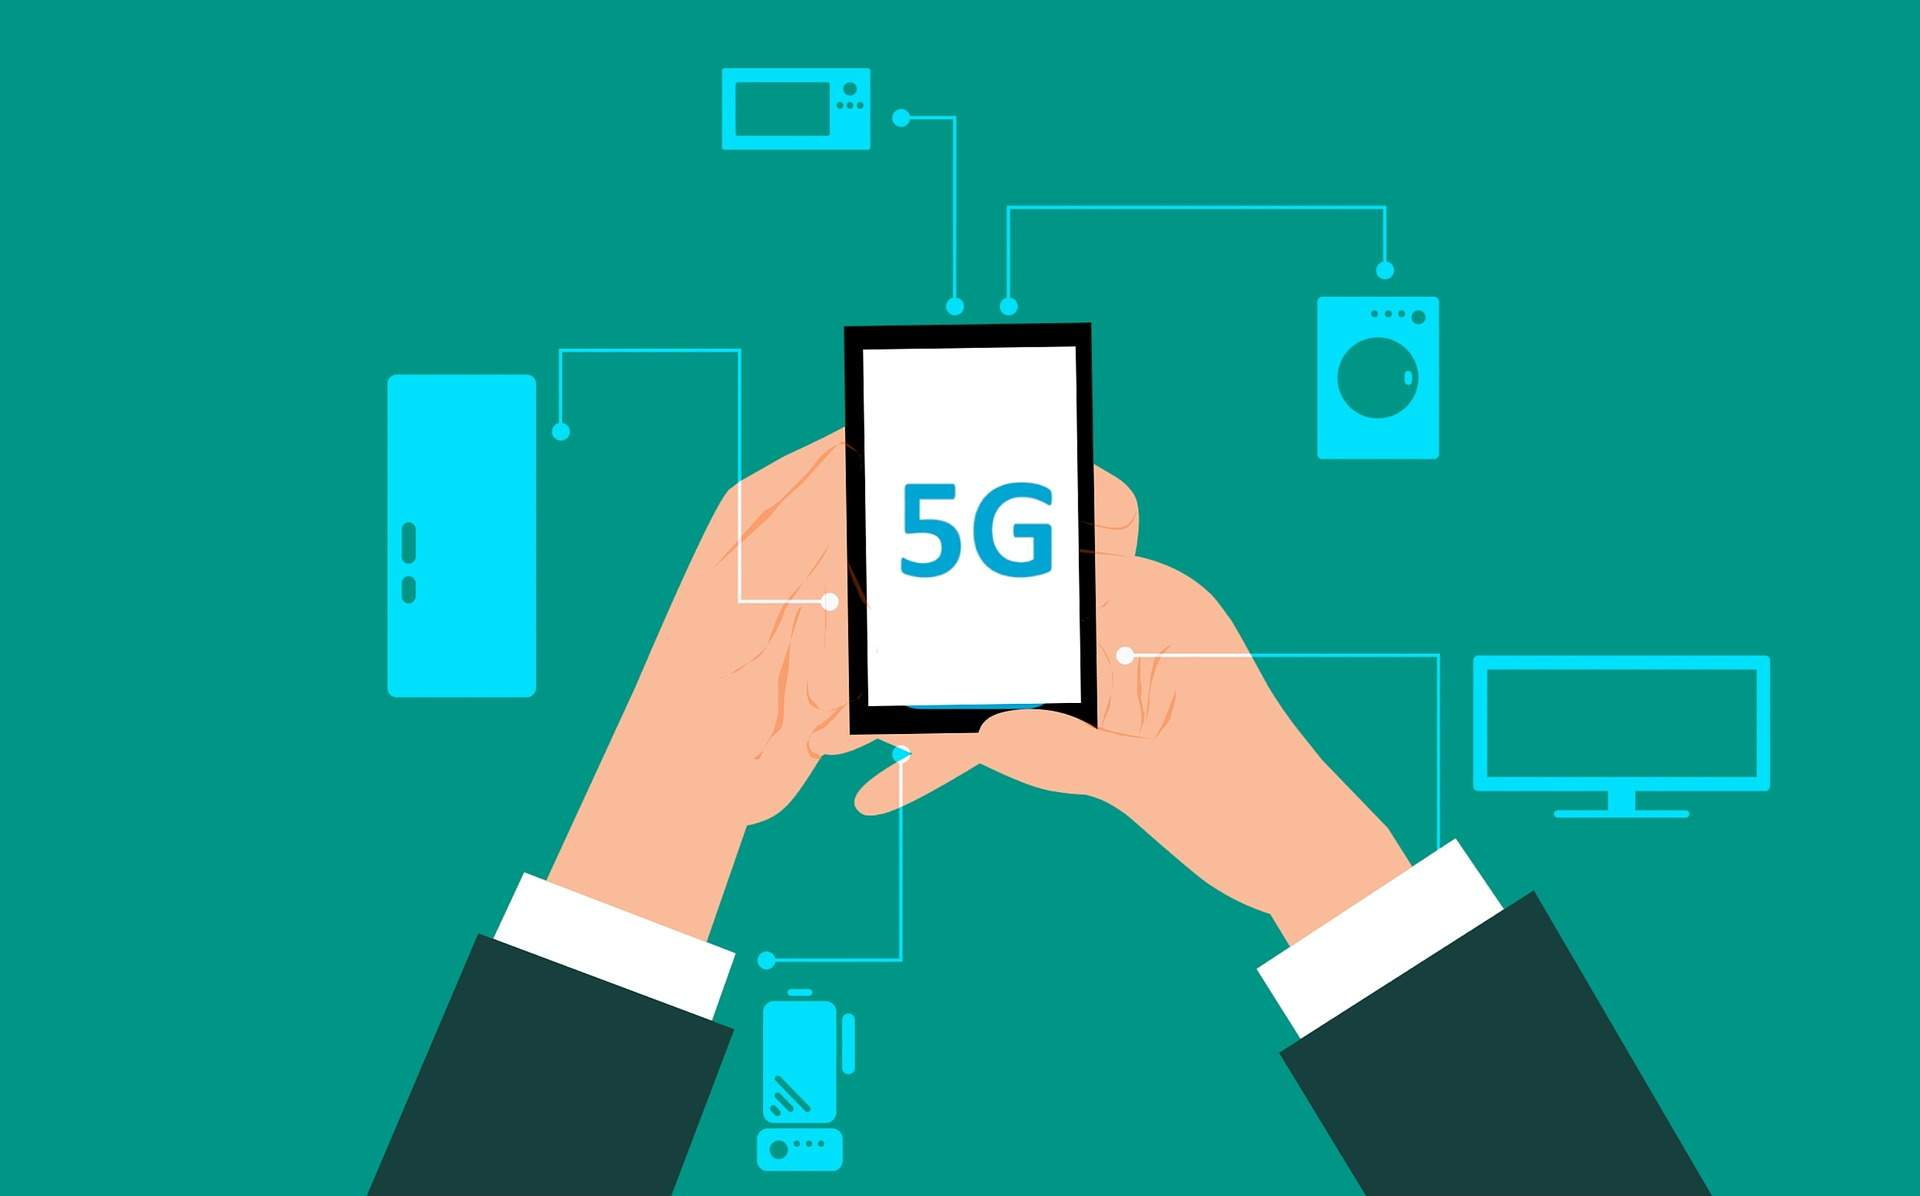 5G, 5g in europe